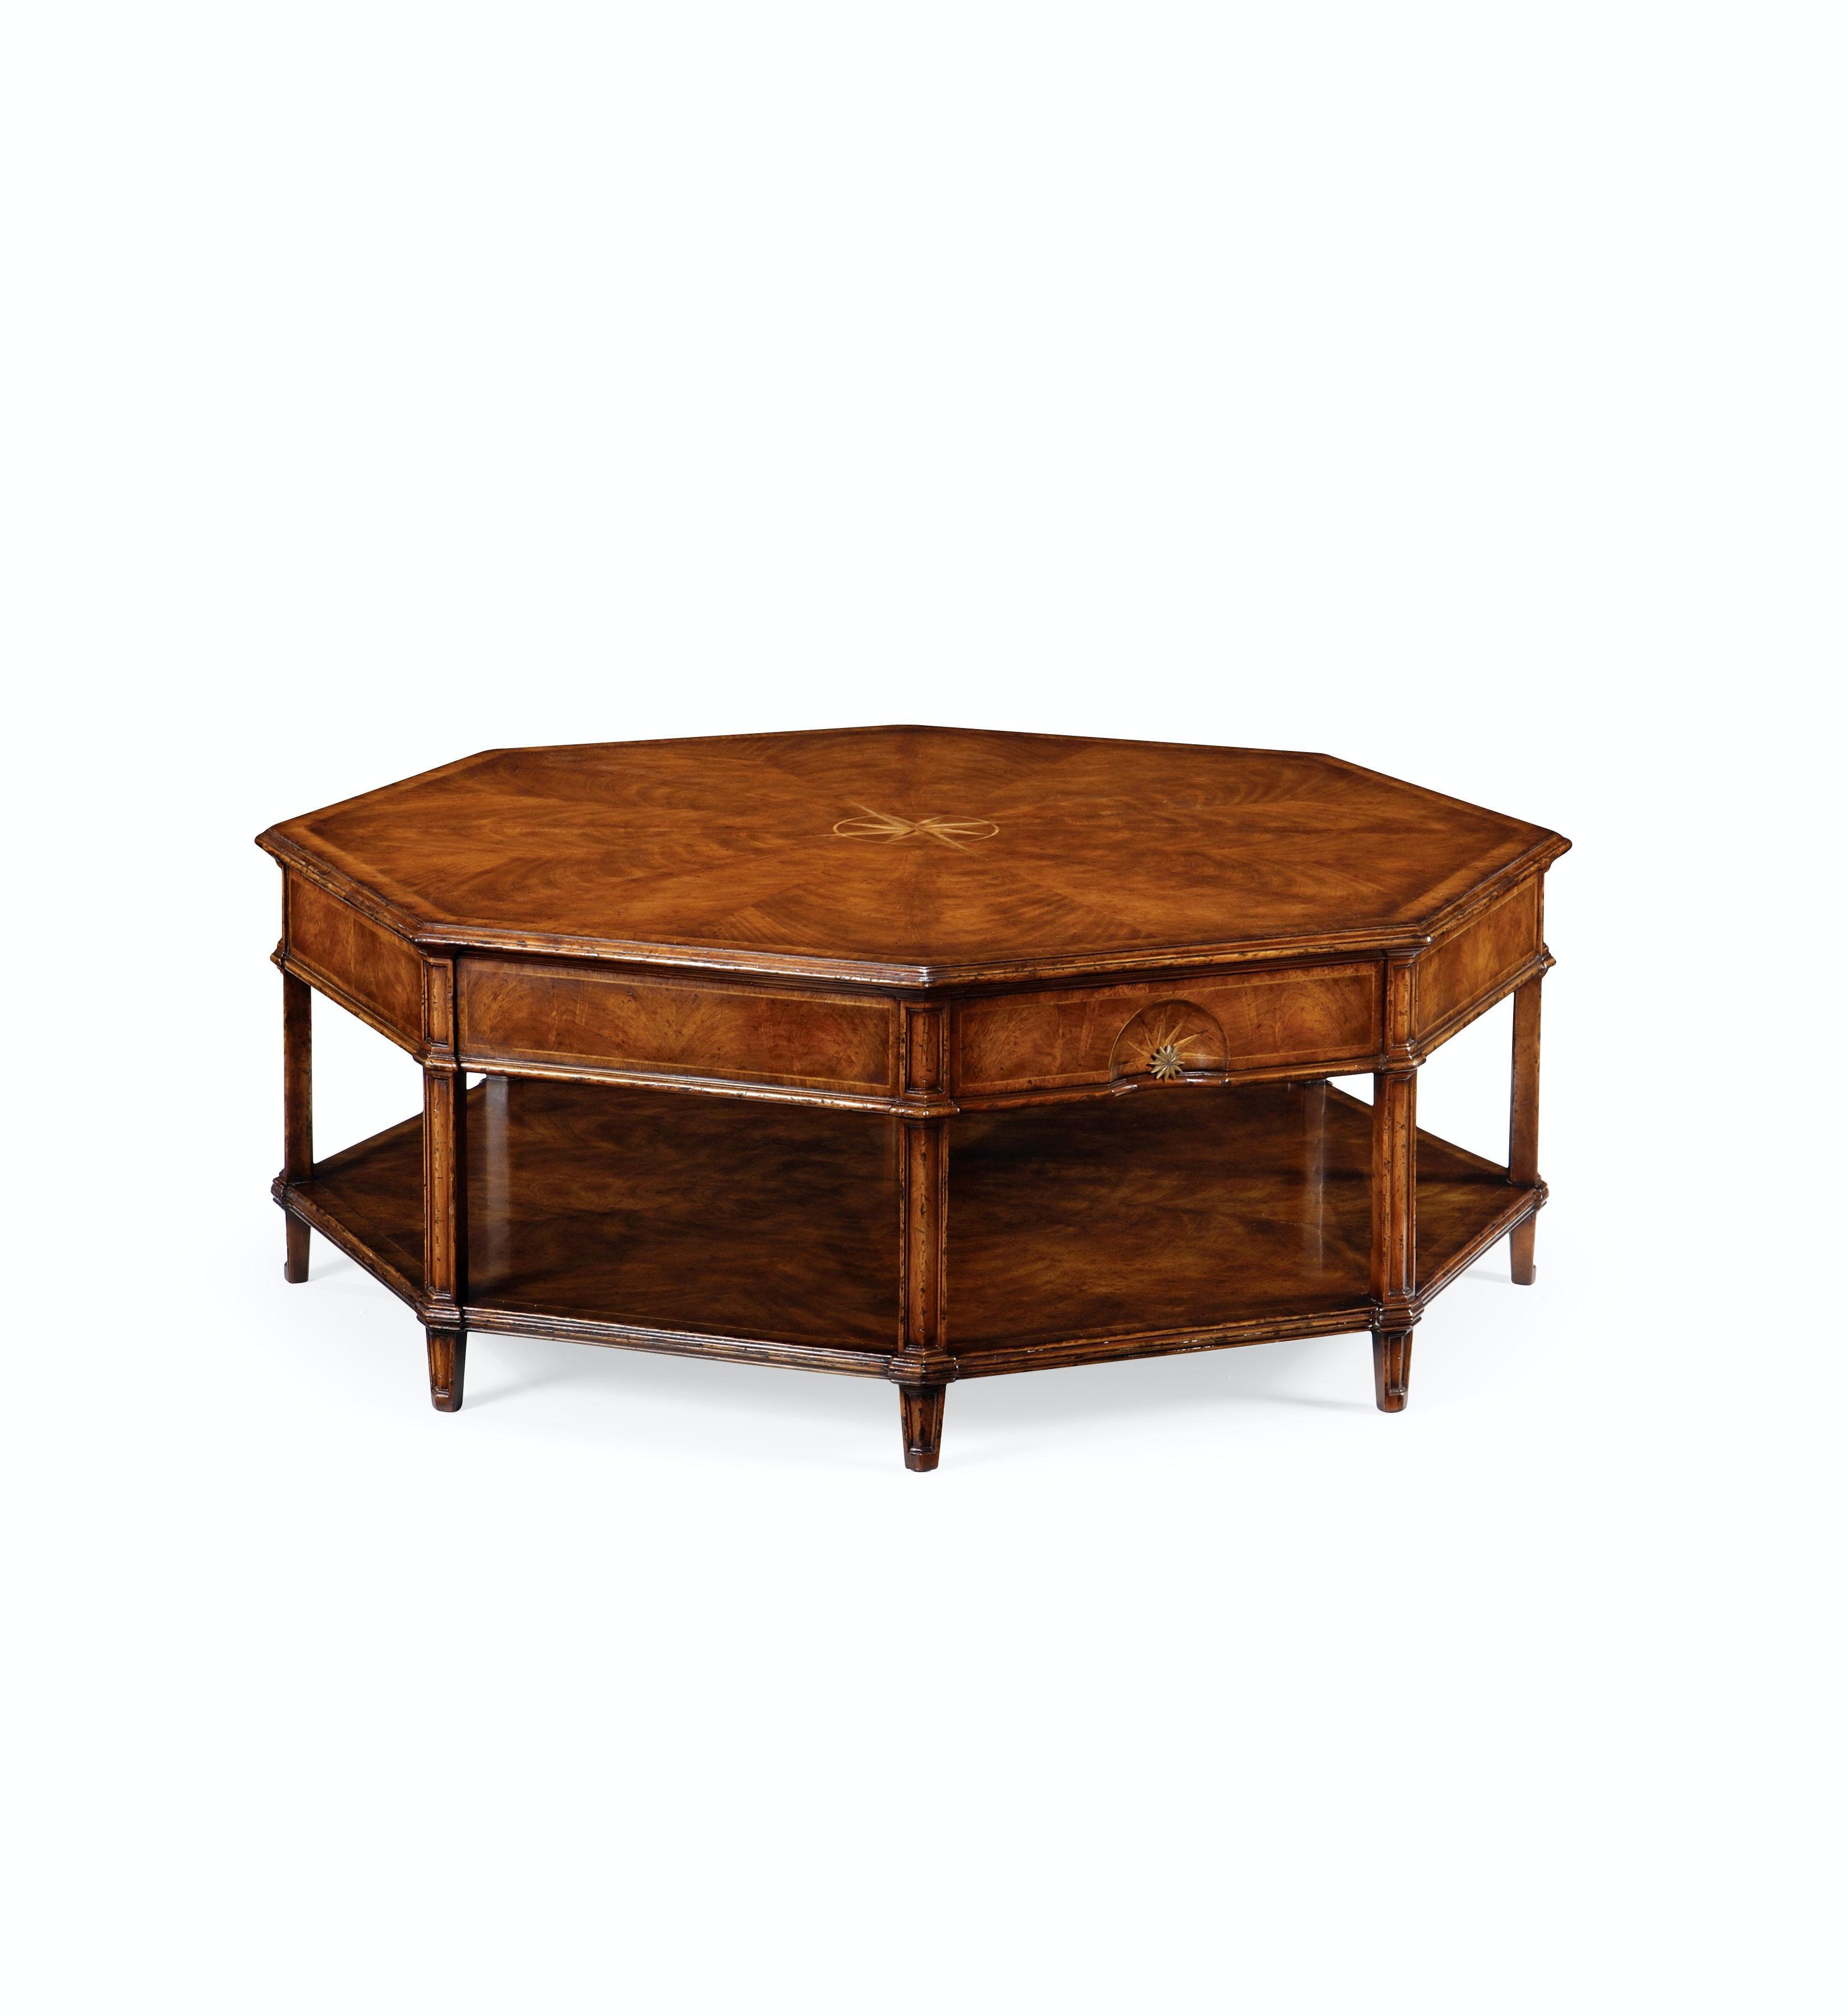 Jonathan Charles Starburst Octagonal Coffee Table 493237 CWM